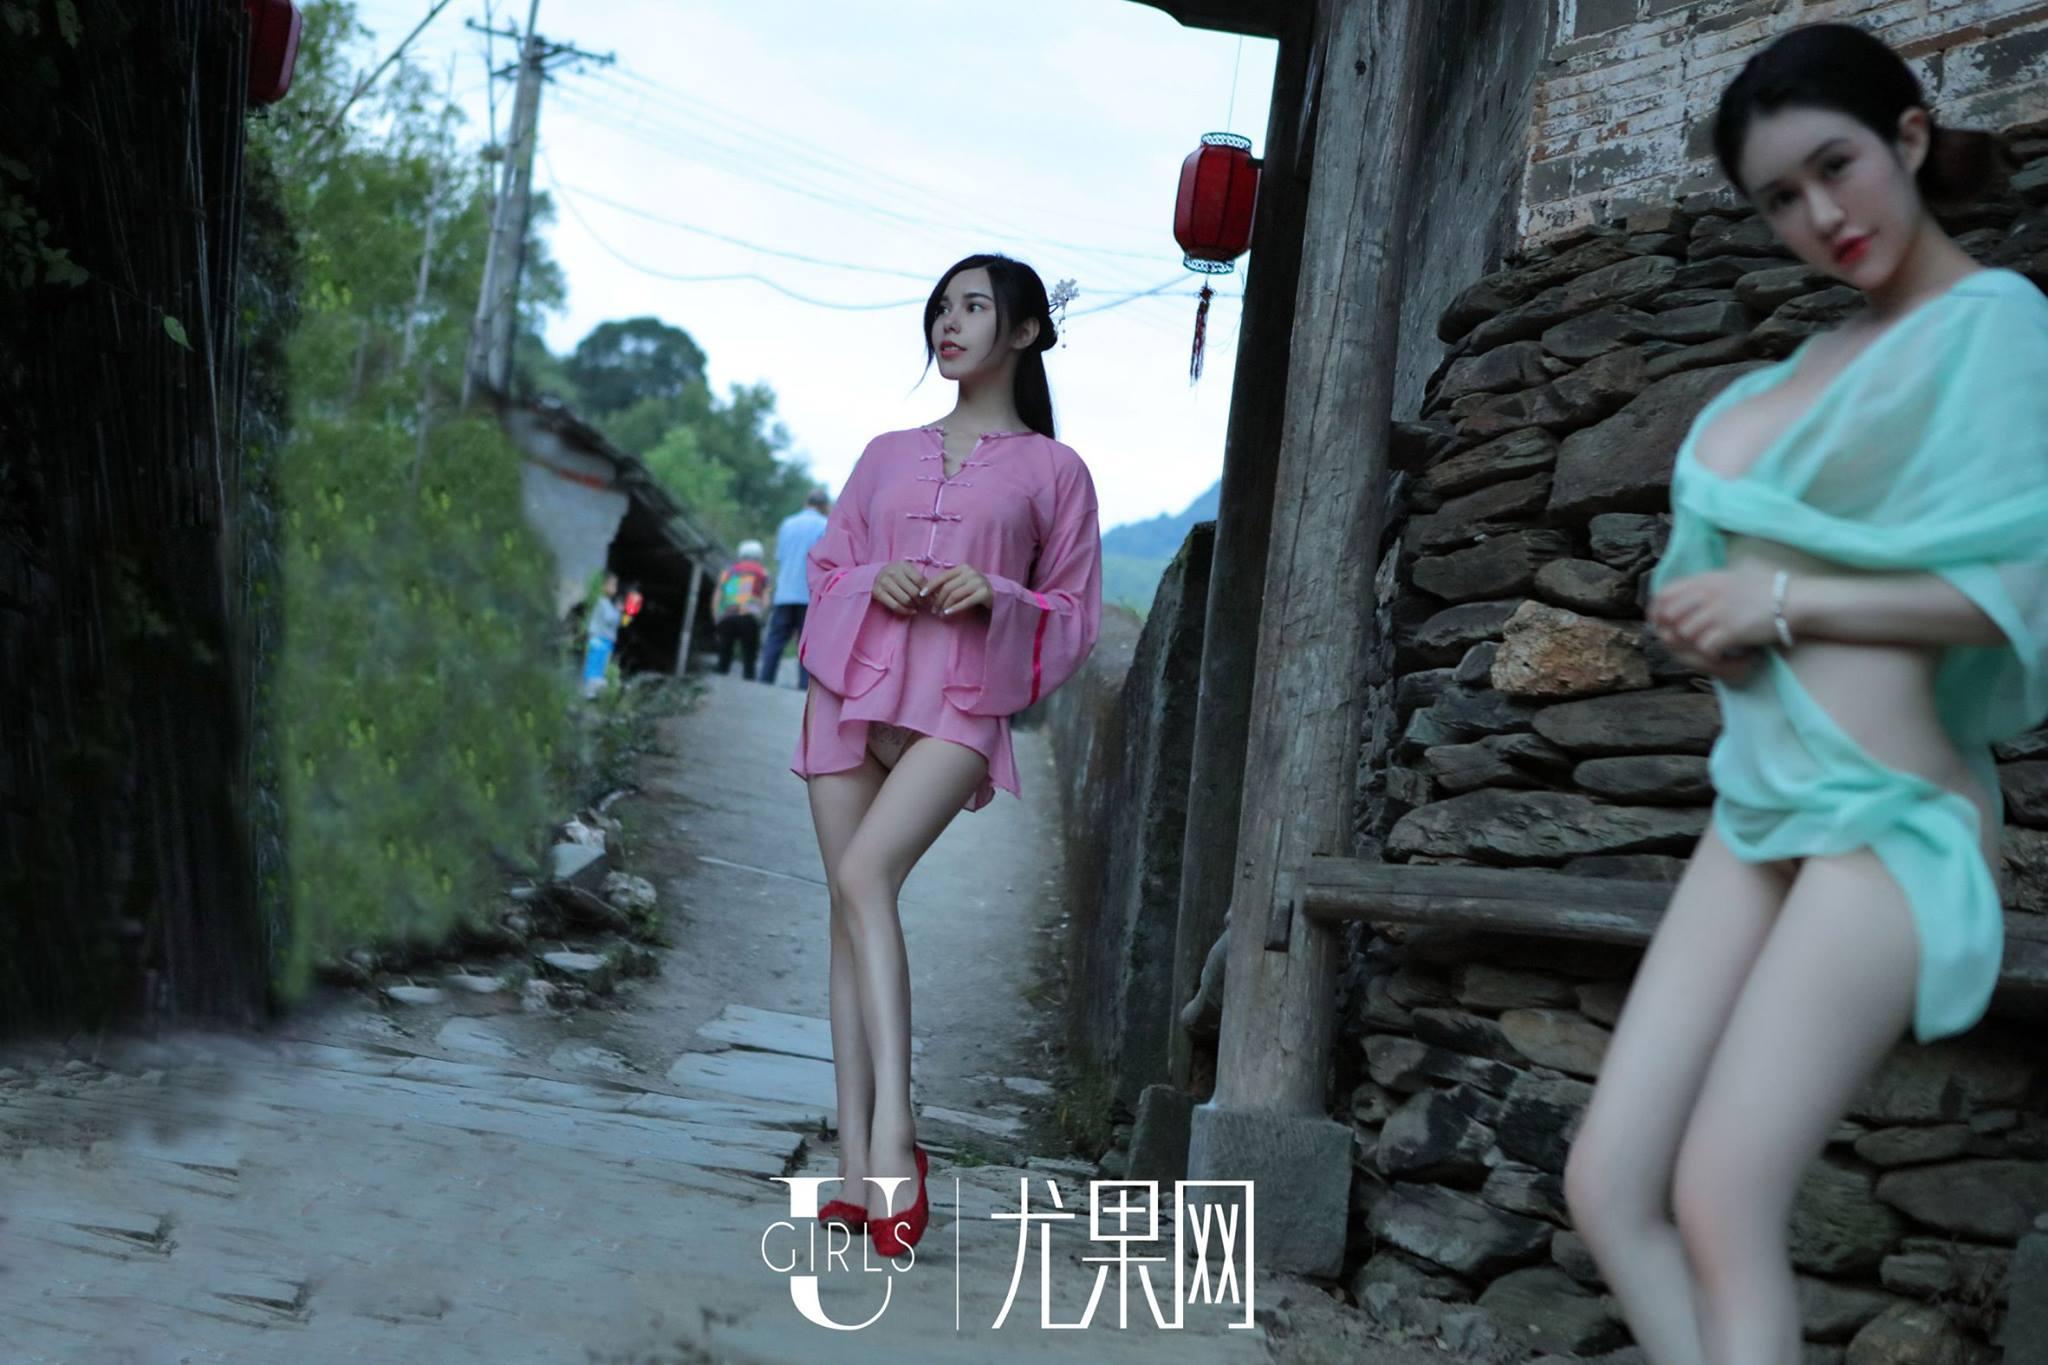 bd886124 coc Ninh Binh 19